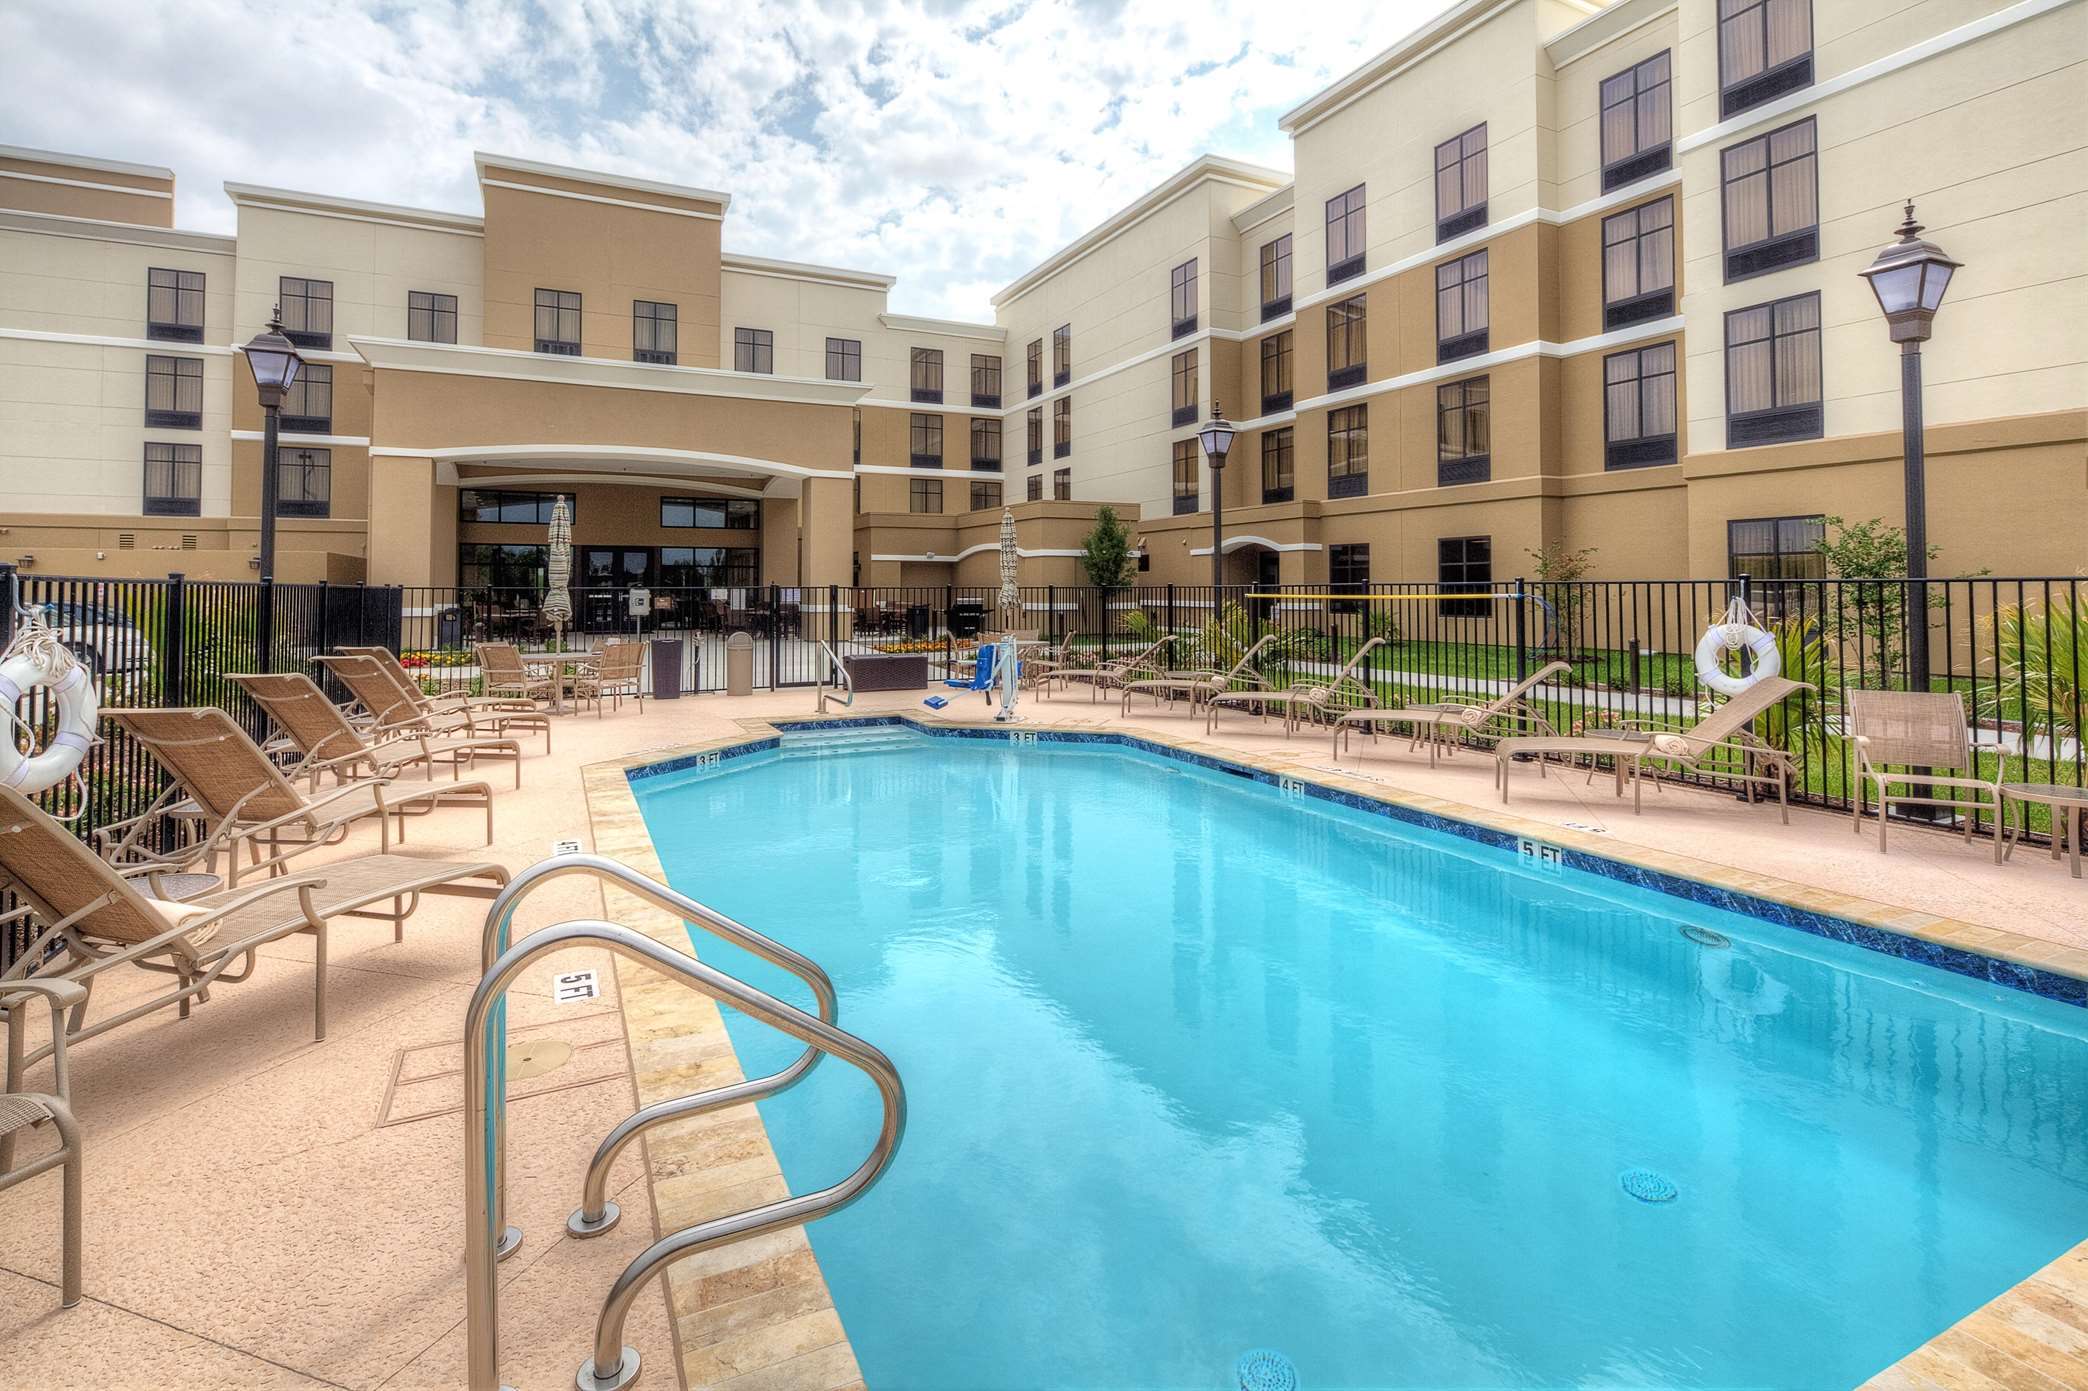 Homewood Suites by Hilton Victoria, TX image 8